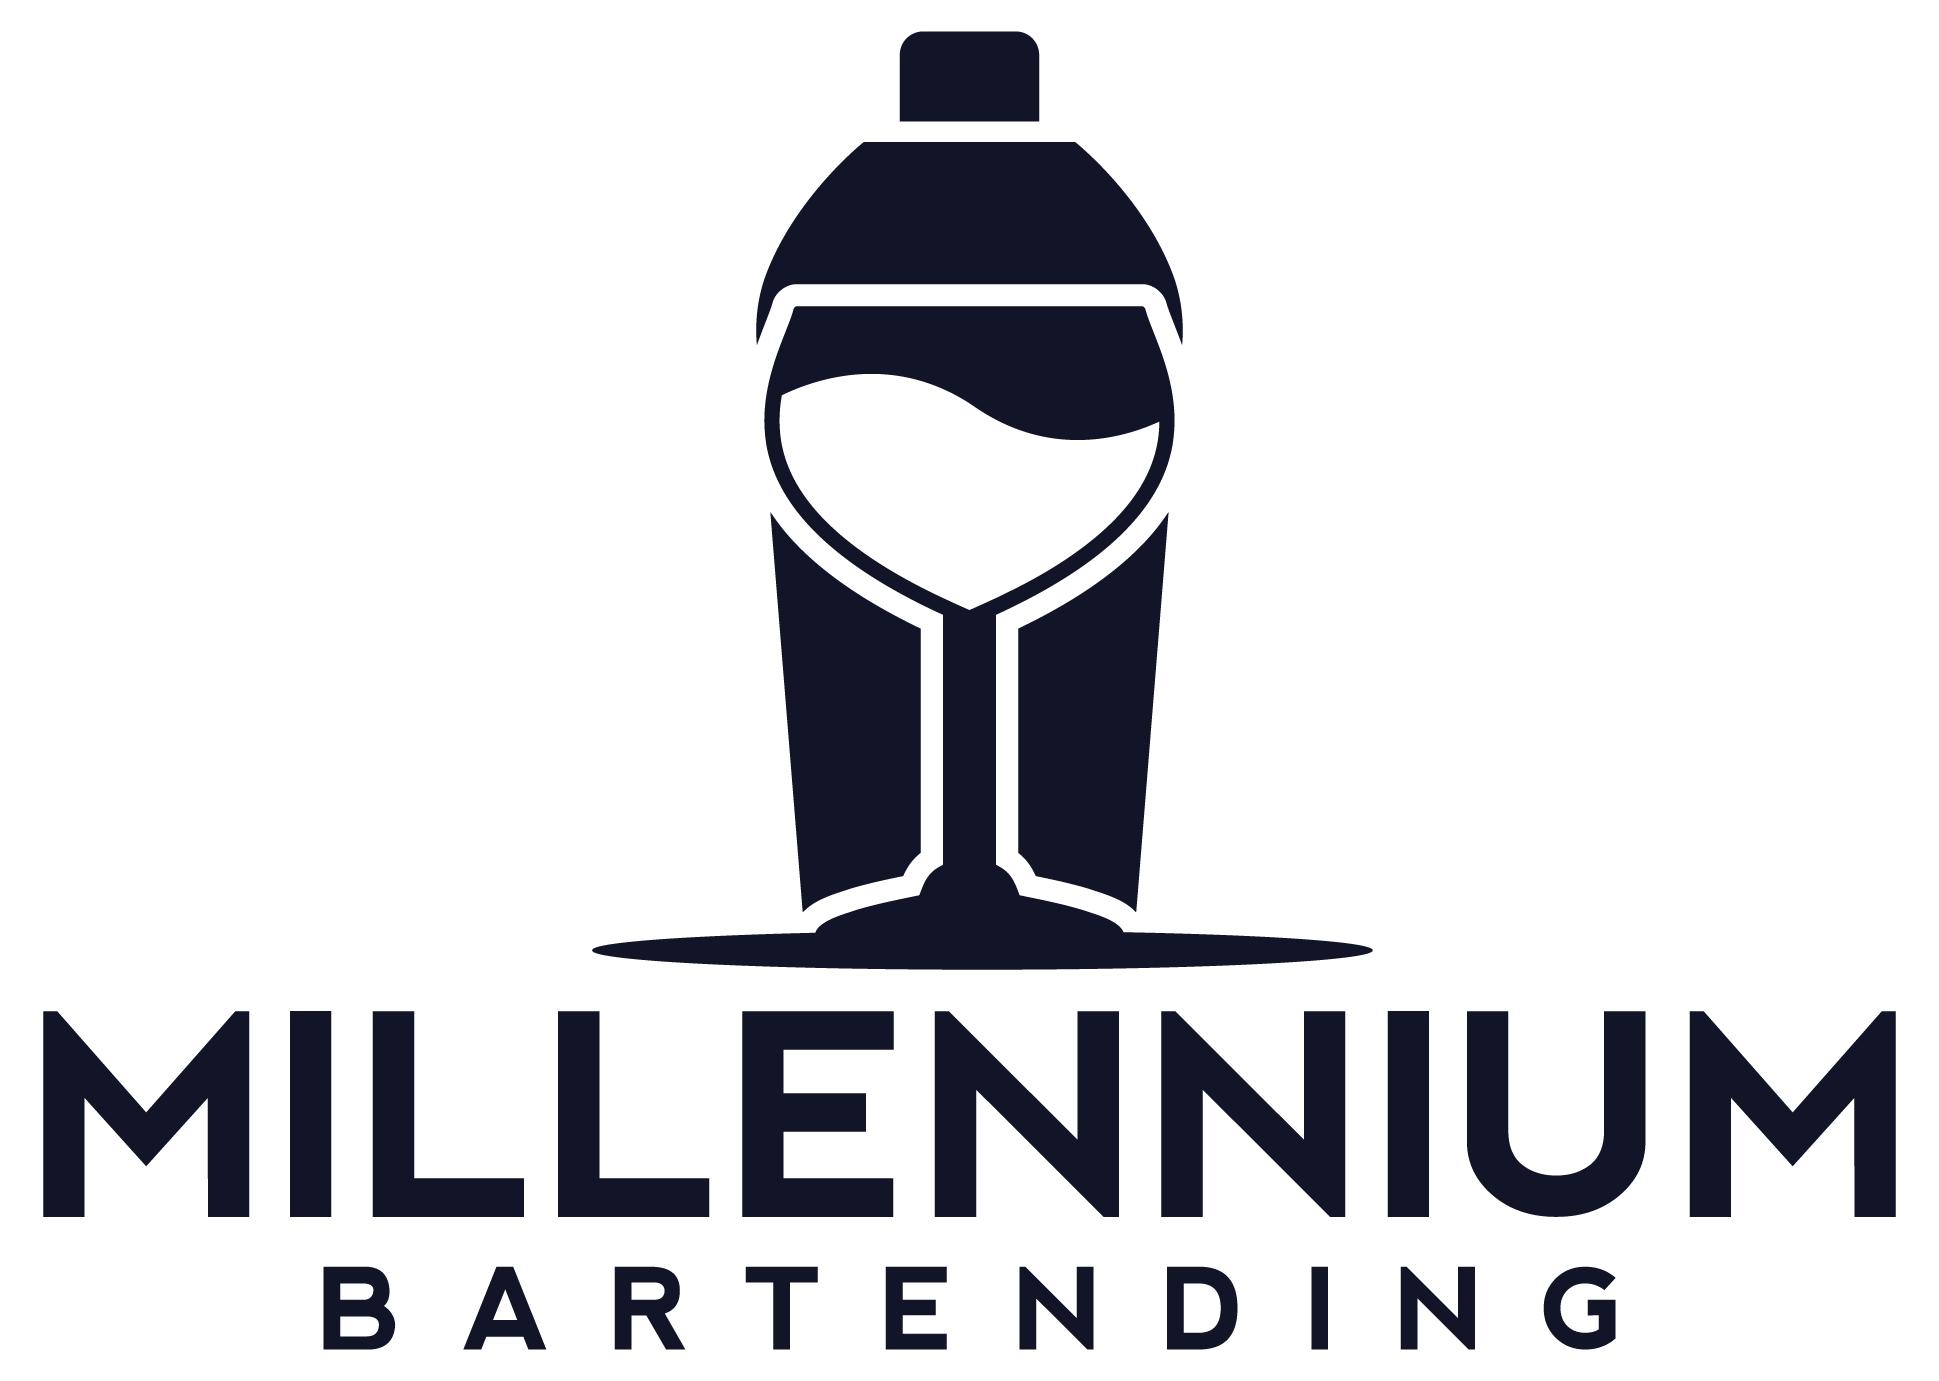 Millennium Bartending - Testbericht